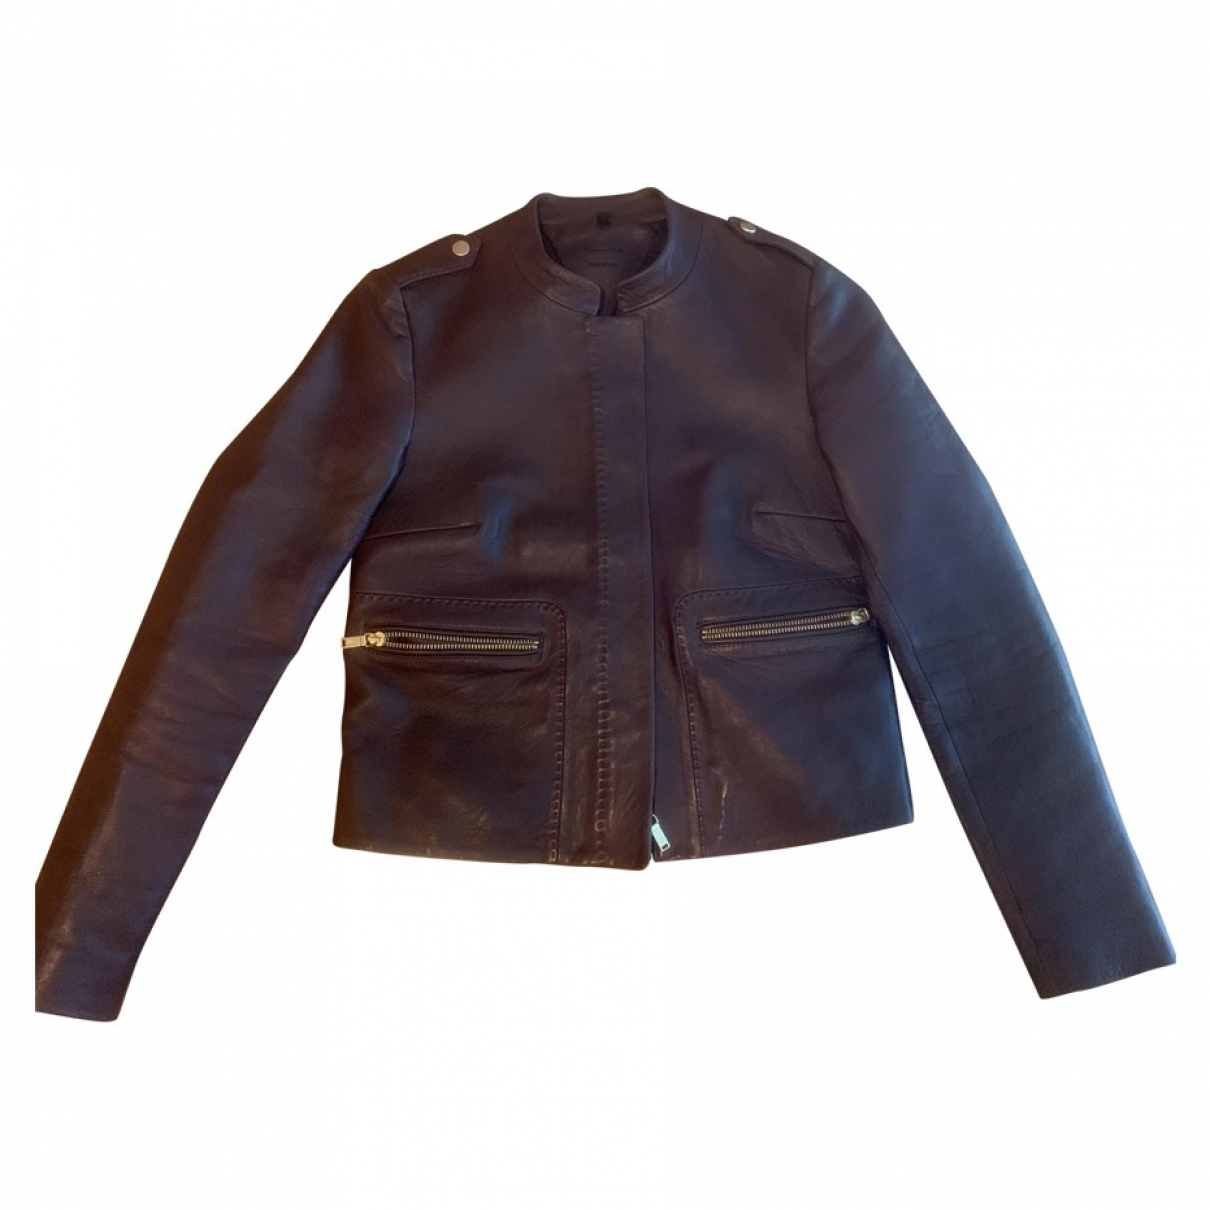 Massimo Dutti \N Burgundy Leather jacket for Women XS International